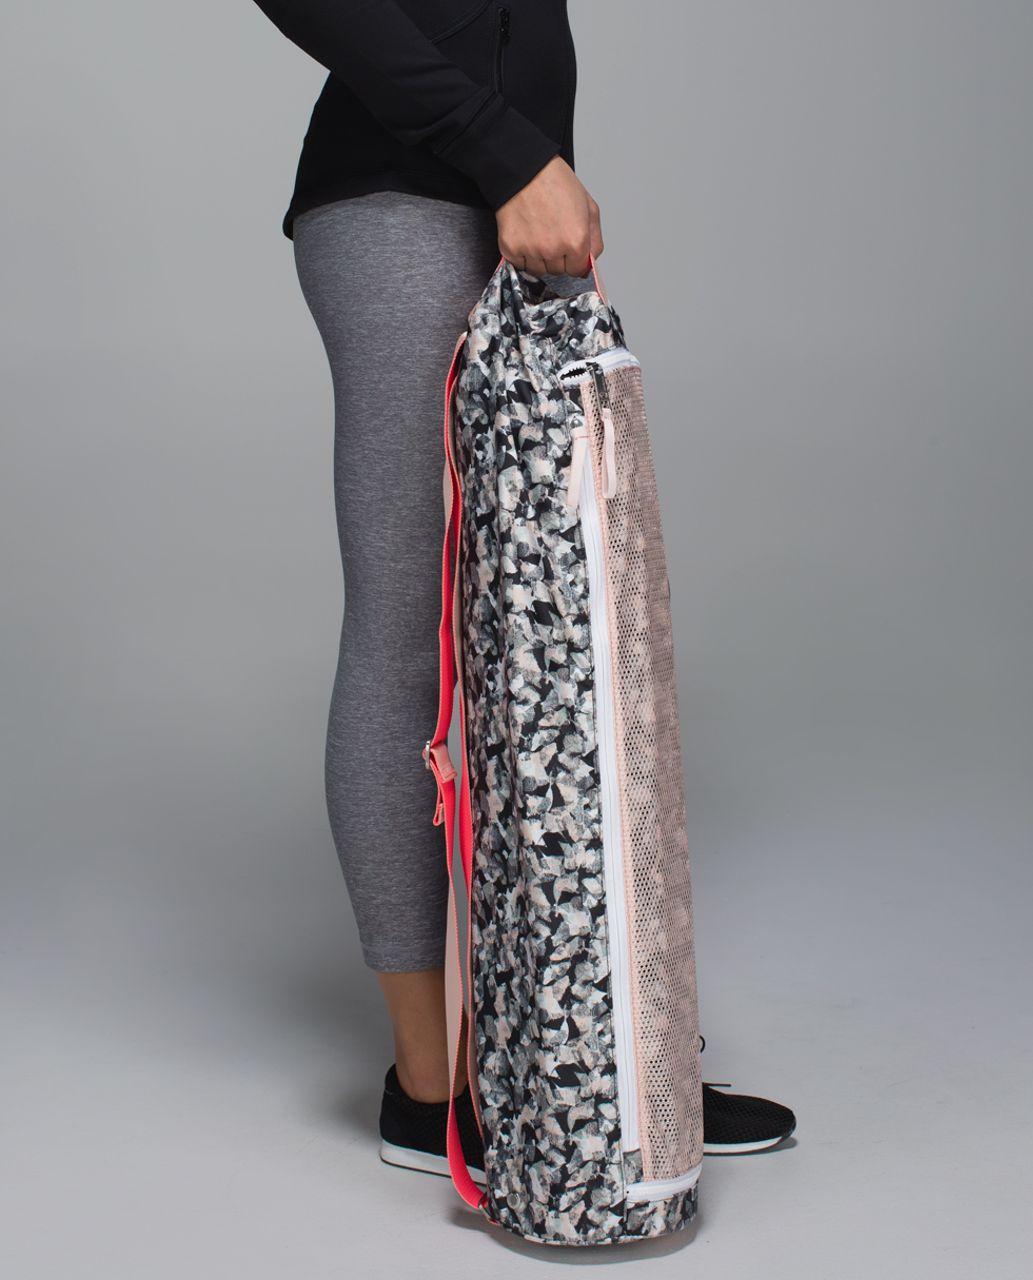 Lululemon Drishti Yoga Tote - Mystic Jungle Butter Pink Black / Butter Pink